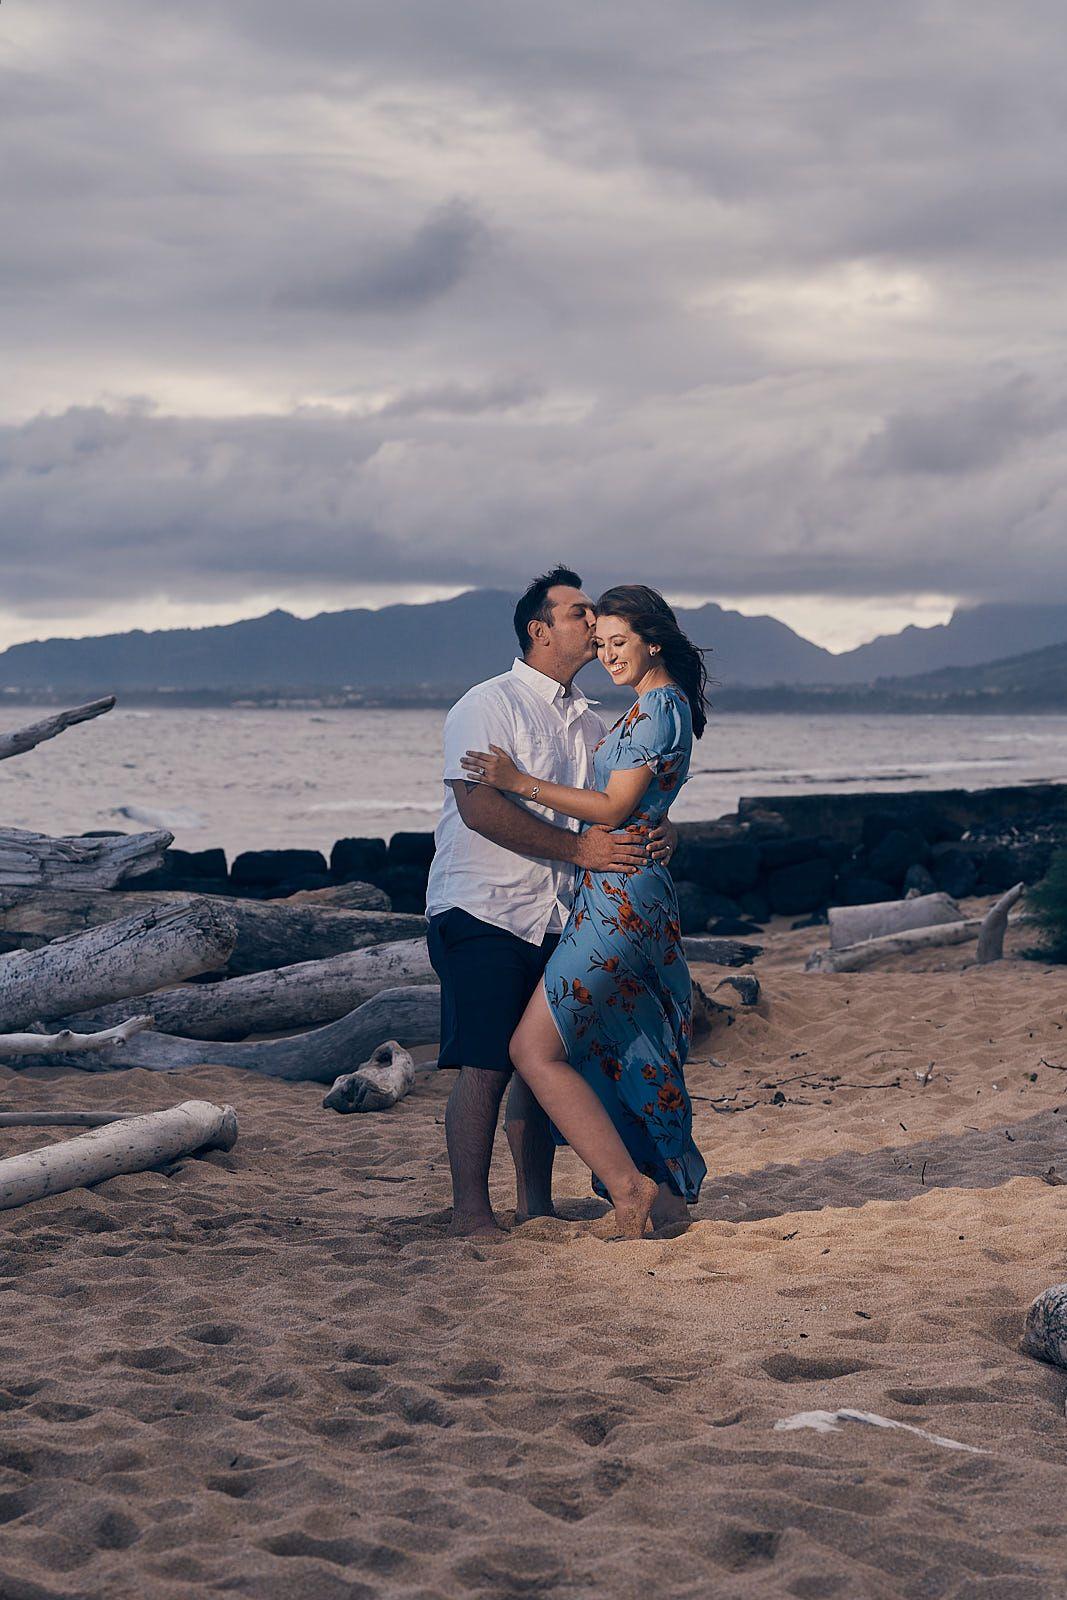 engagement-photo-shoot-east-kauai-beach-location-afewgoodclicks 44